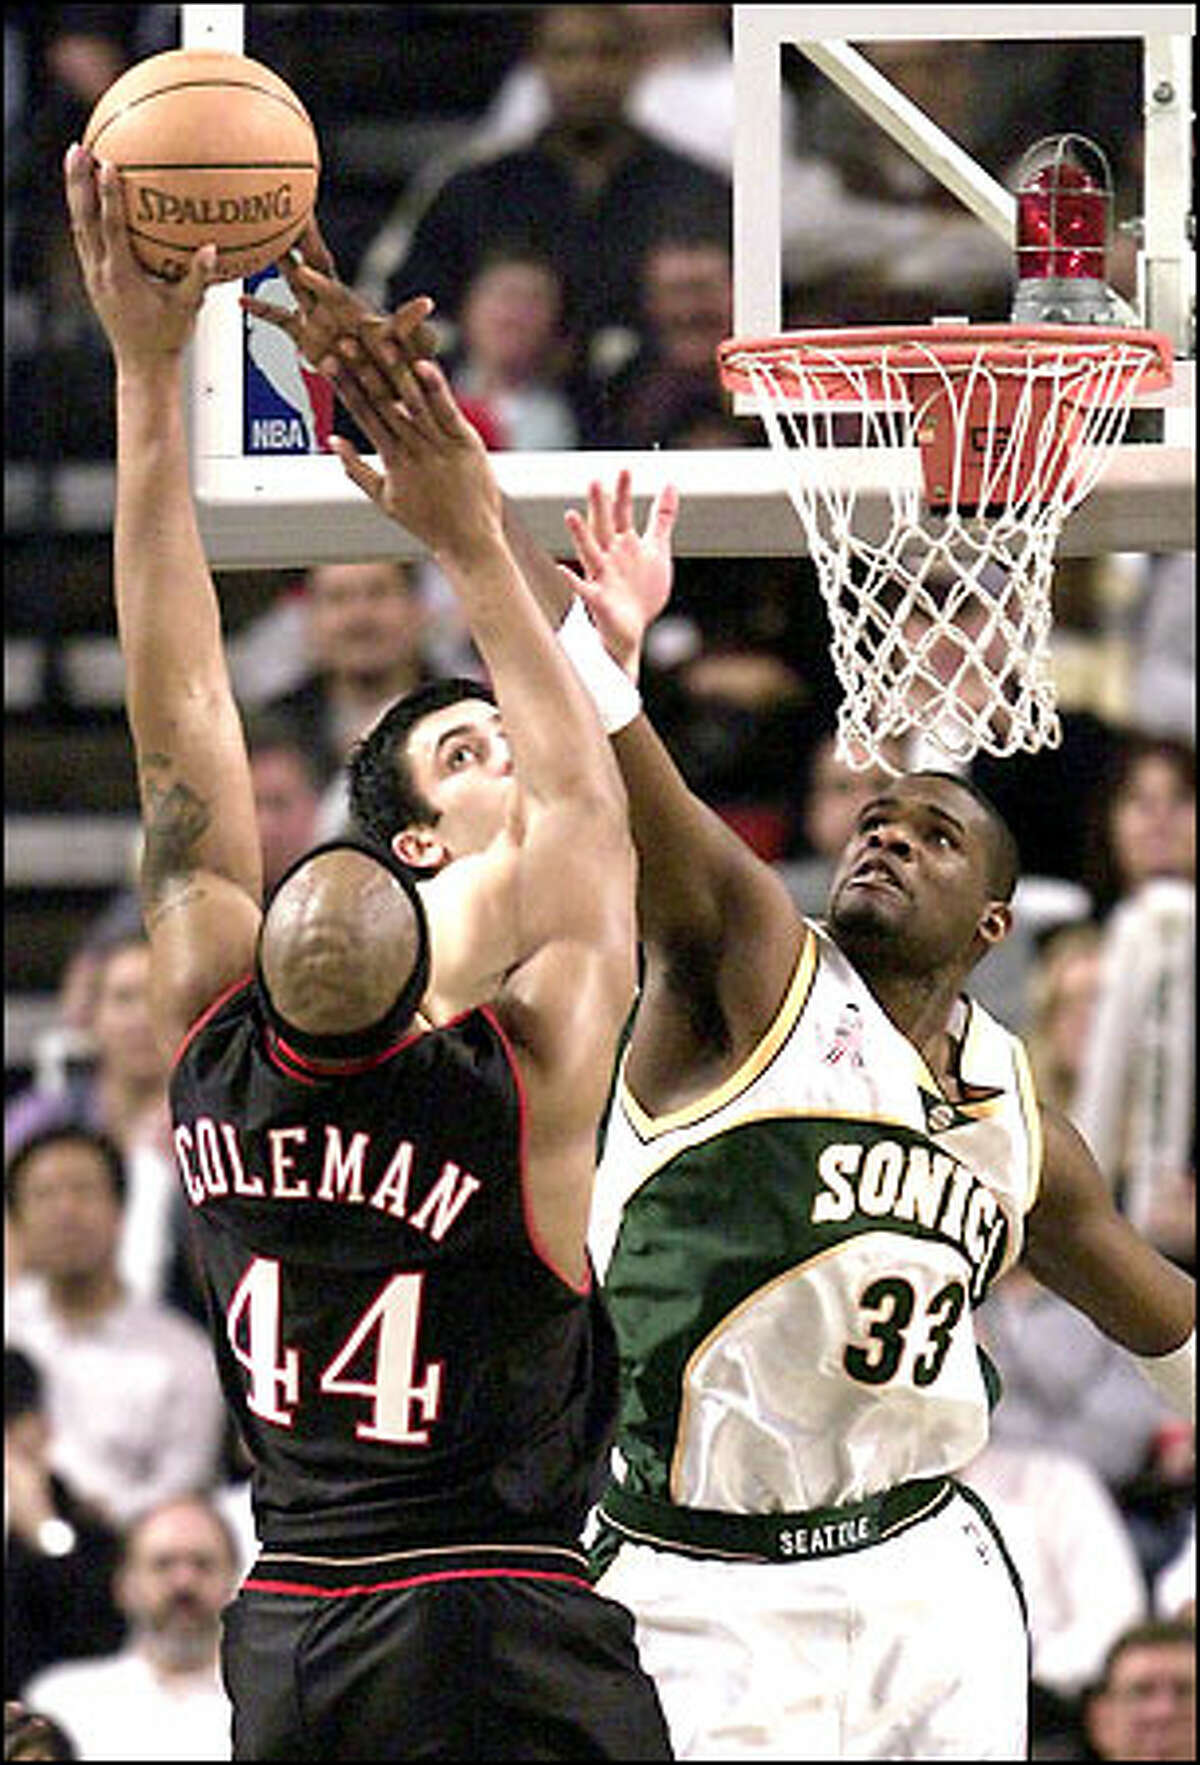 Philadelphia's Derrick Coleman shots a basket over Jerome James (33) and Vladimir Radmanovic.